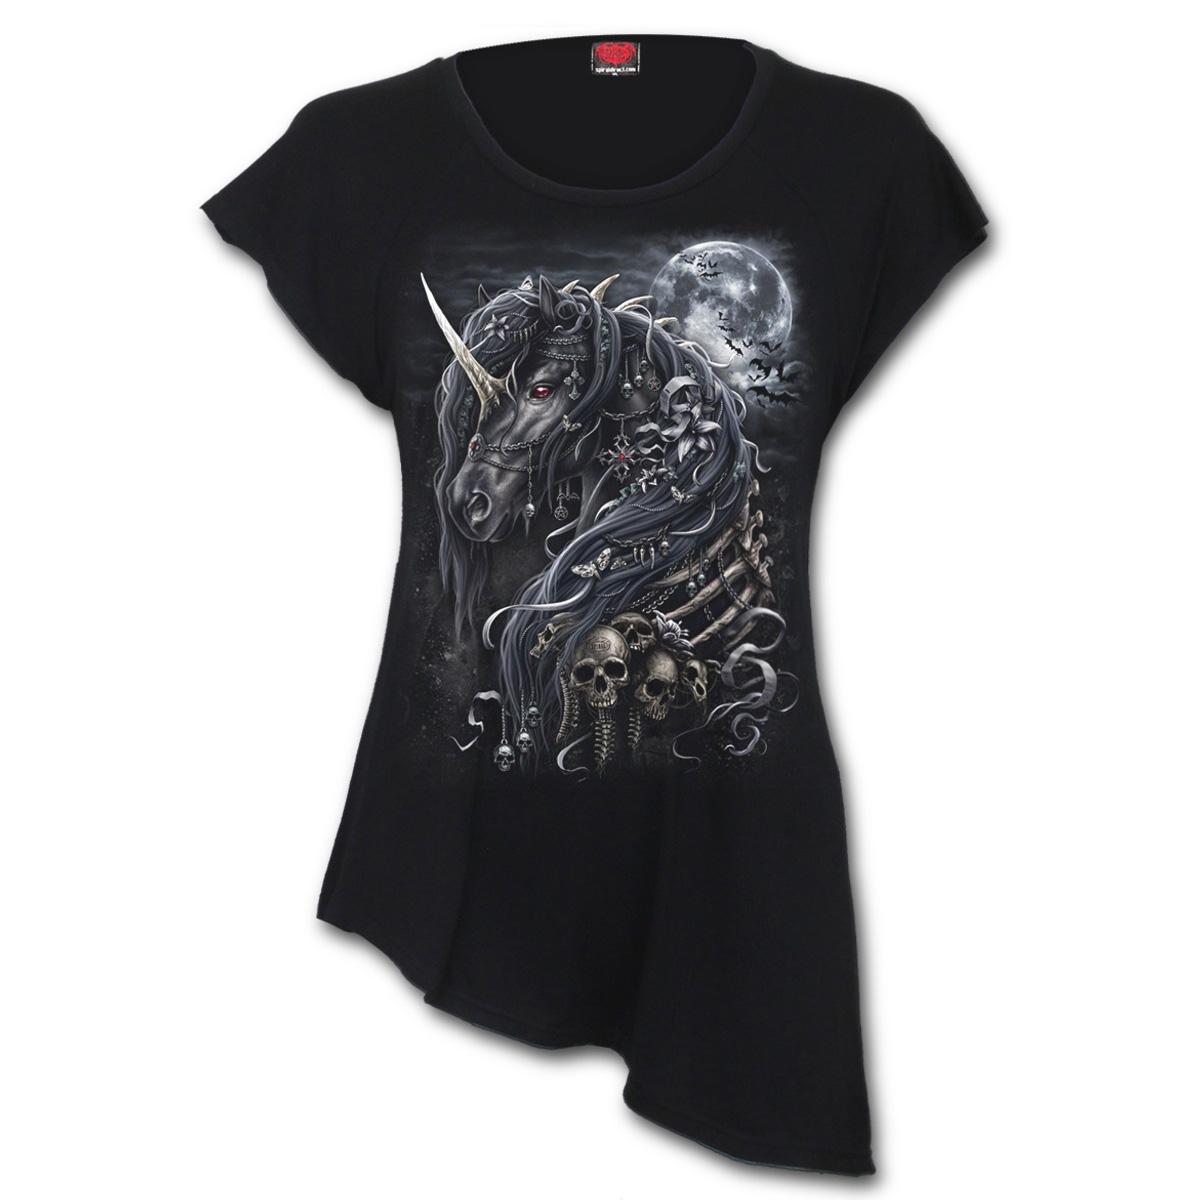 Spiral-Direct-Ladies-Black-Goth-DARK-UNICORN-Asymmetric-Top-All-Sizes thumbnail 5